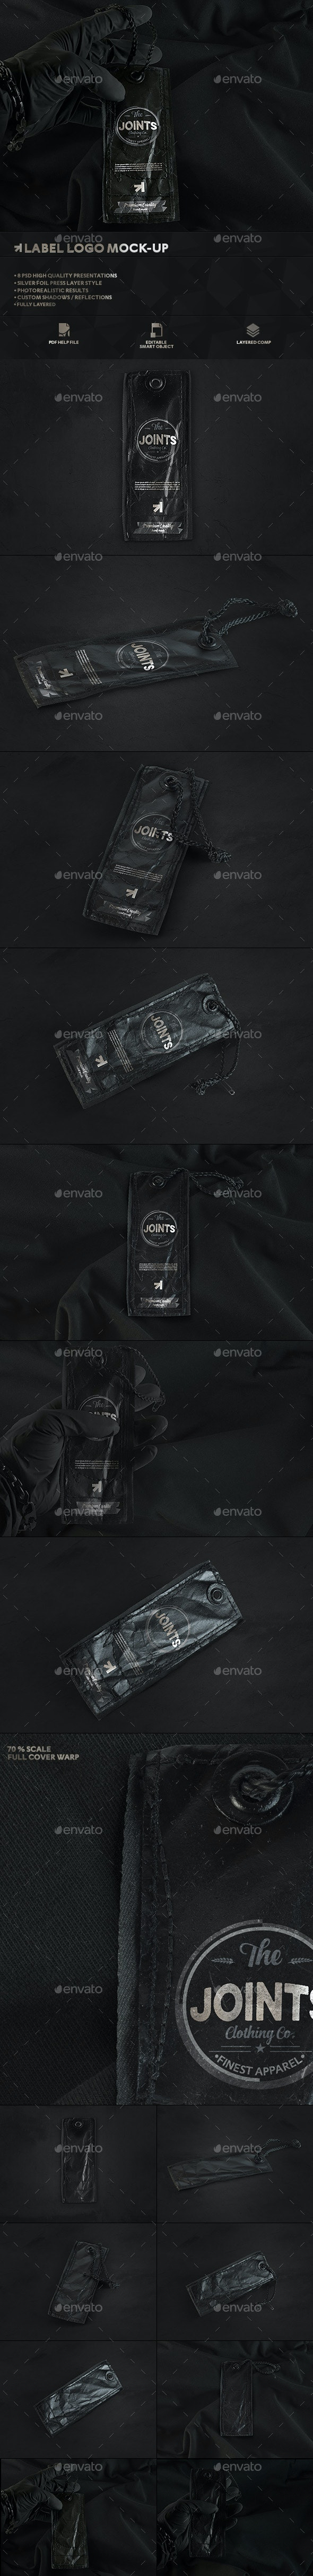 Black Edition Tag Label Mockup - Logo Product Mock-Ups